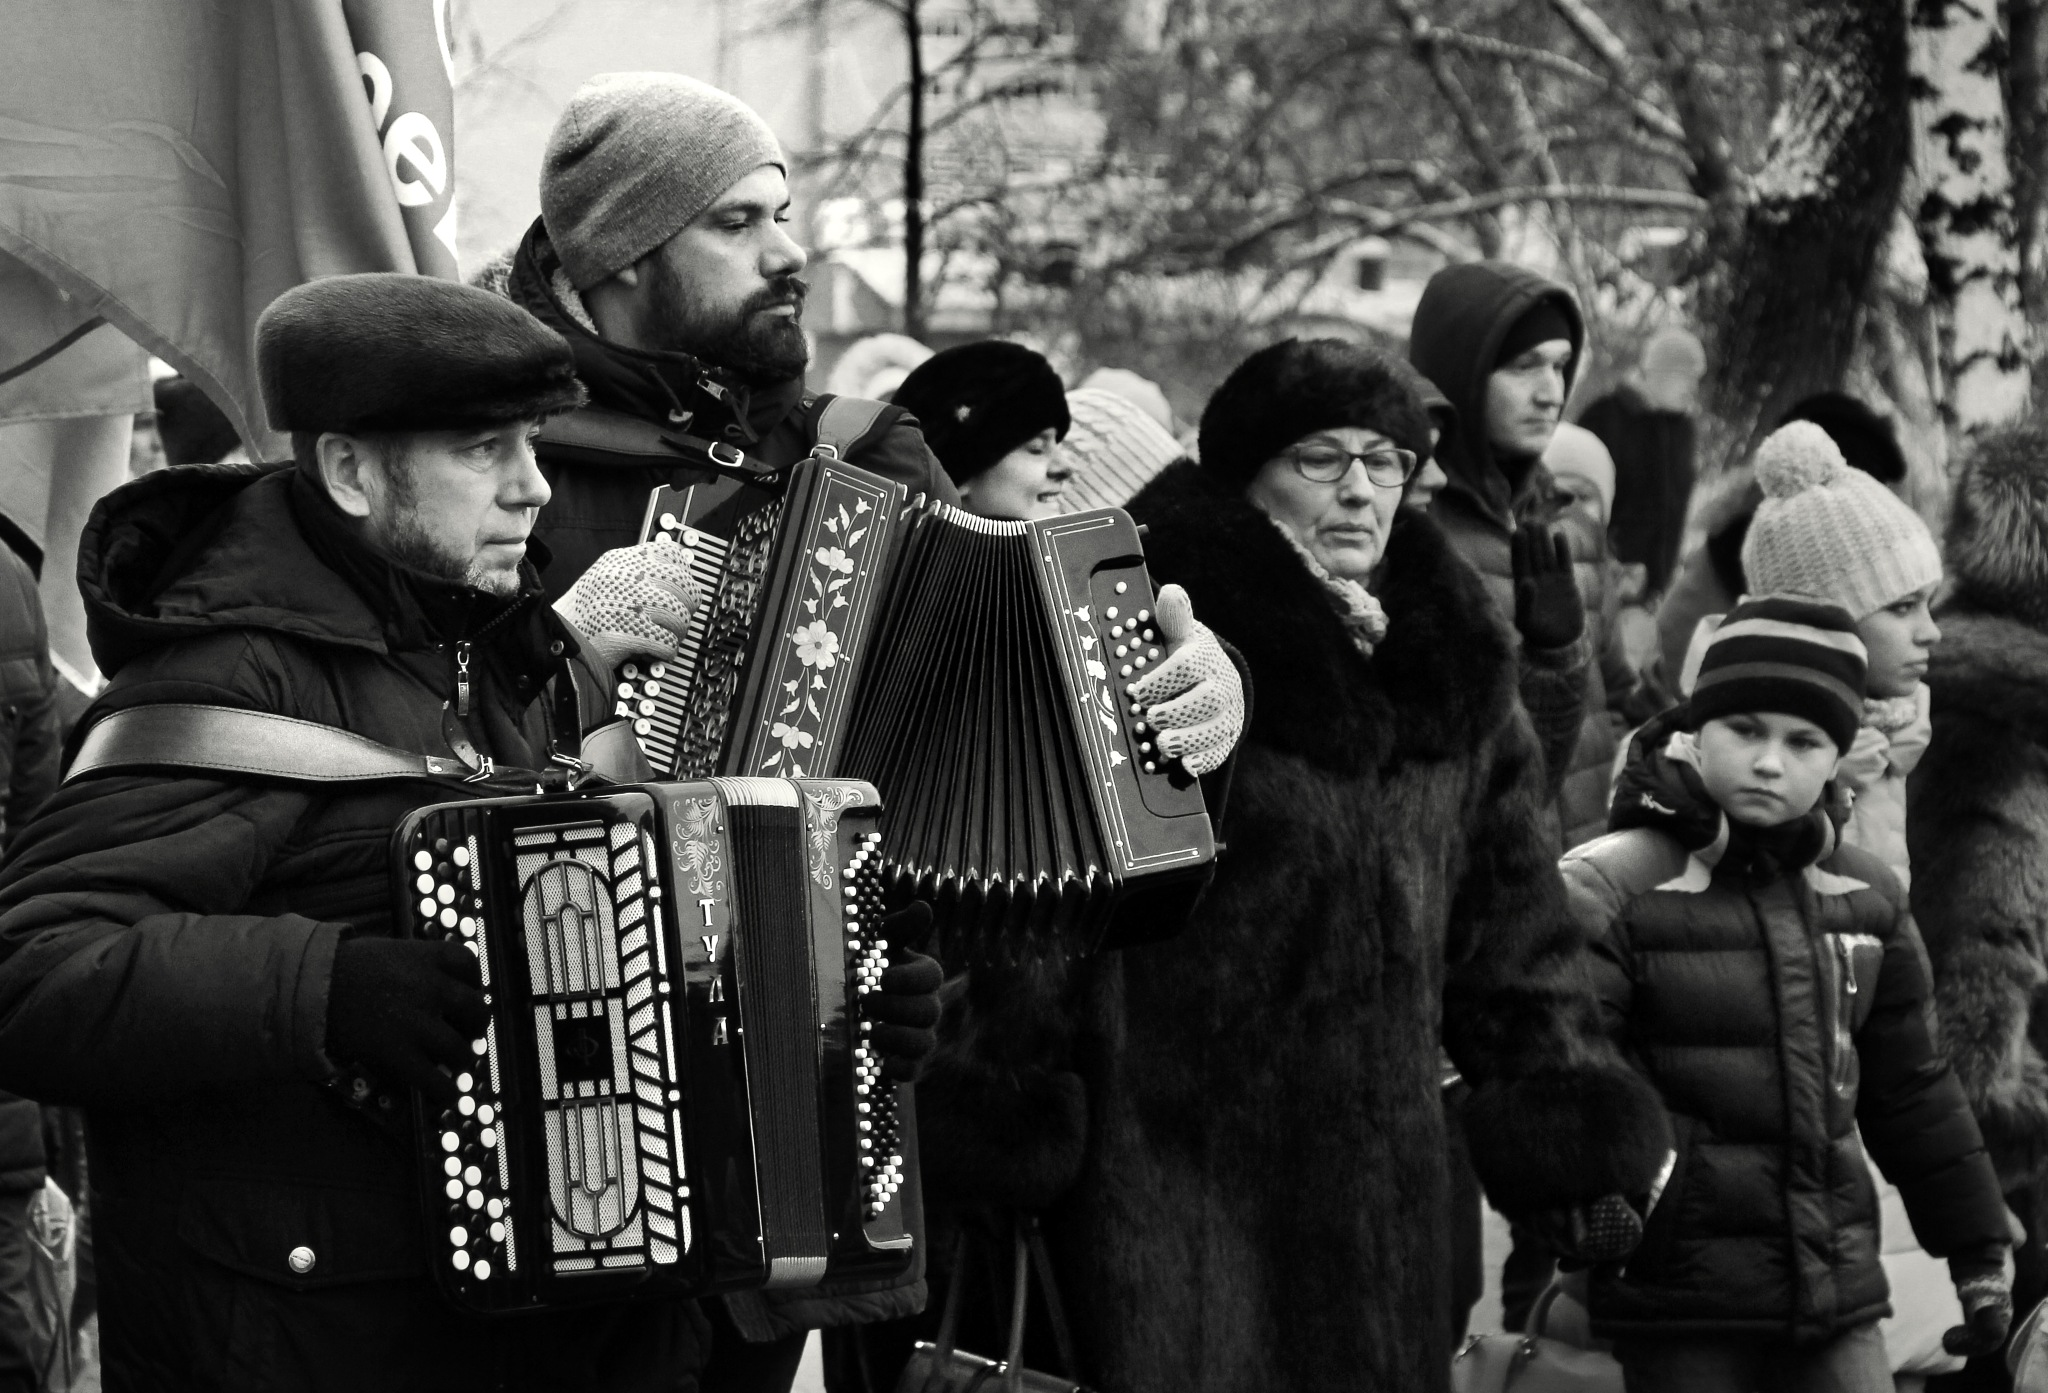 National Unity Day by Сергей Юрьев